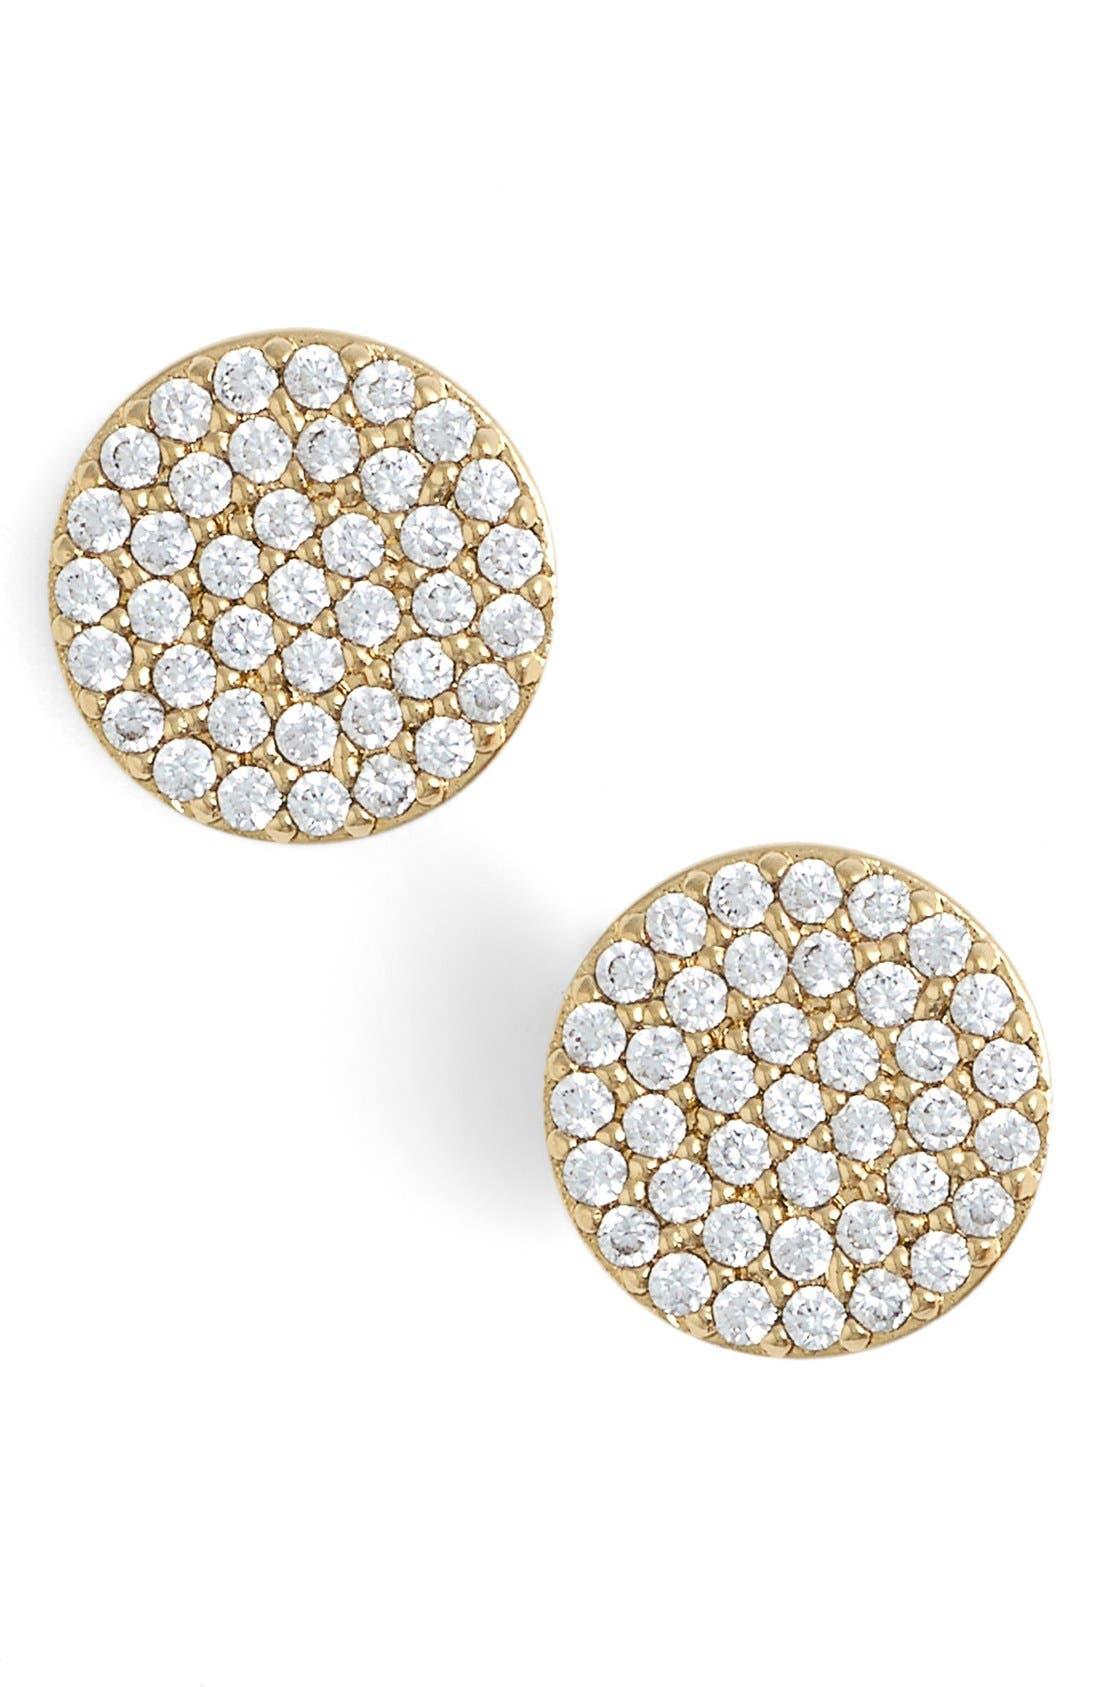 'Geo' Stud Earrings,                             Main thumbnail 1, color,                             GOLD